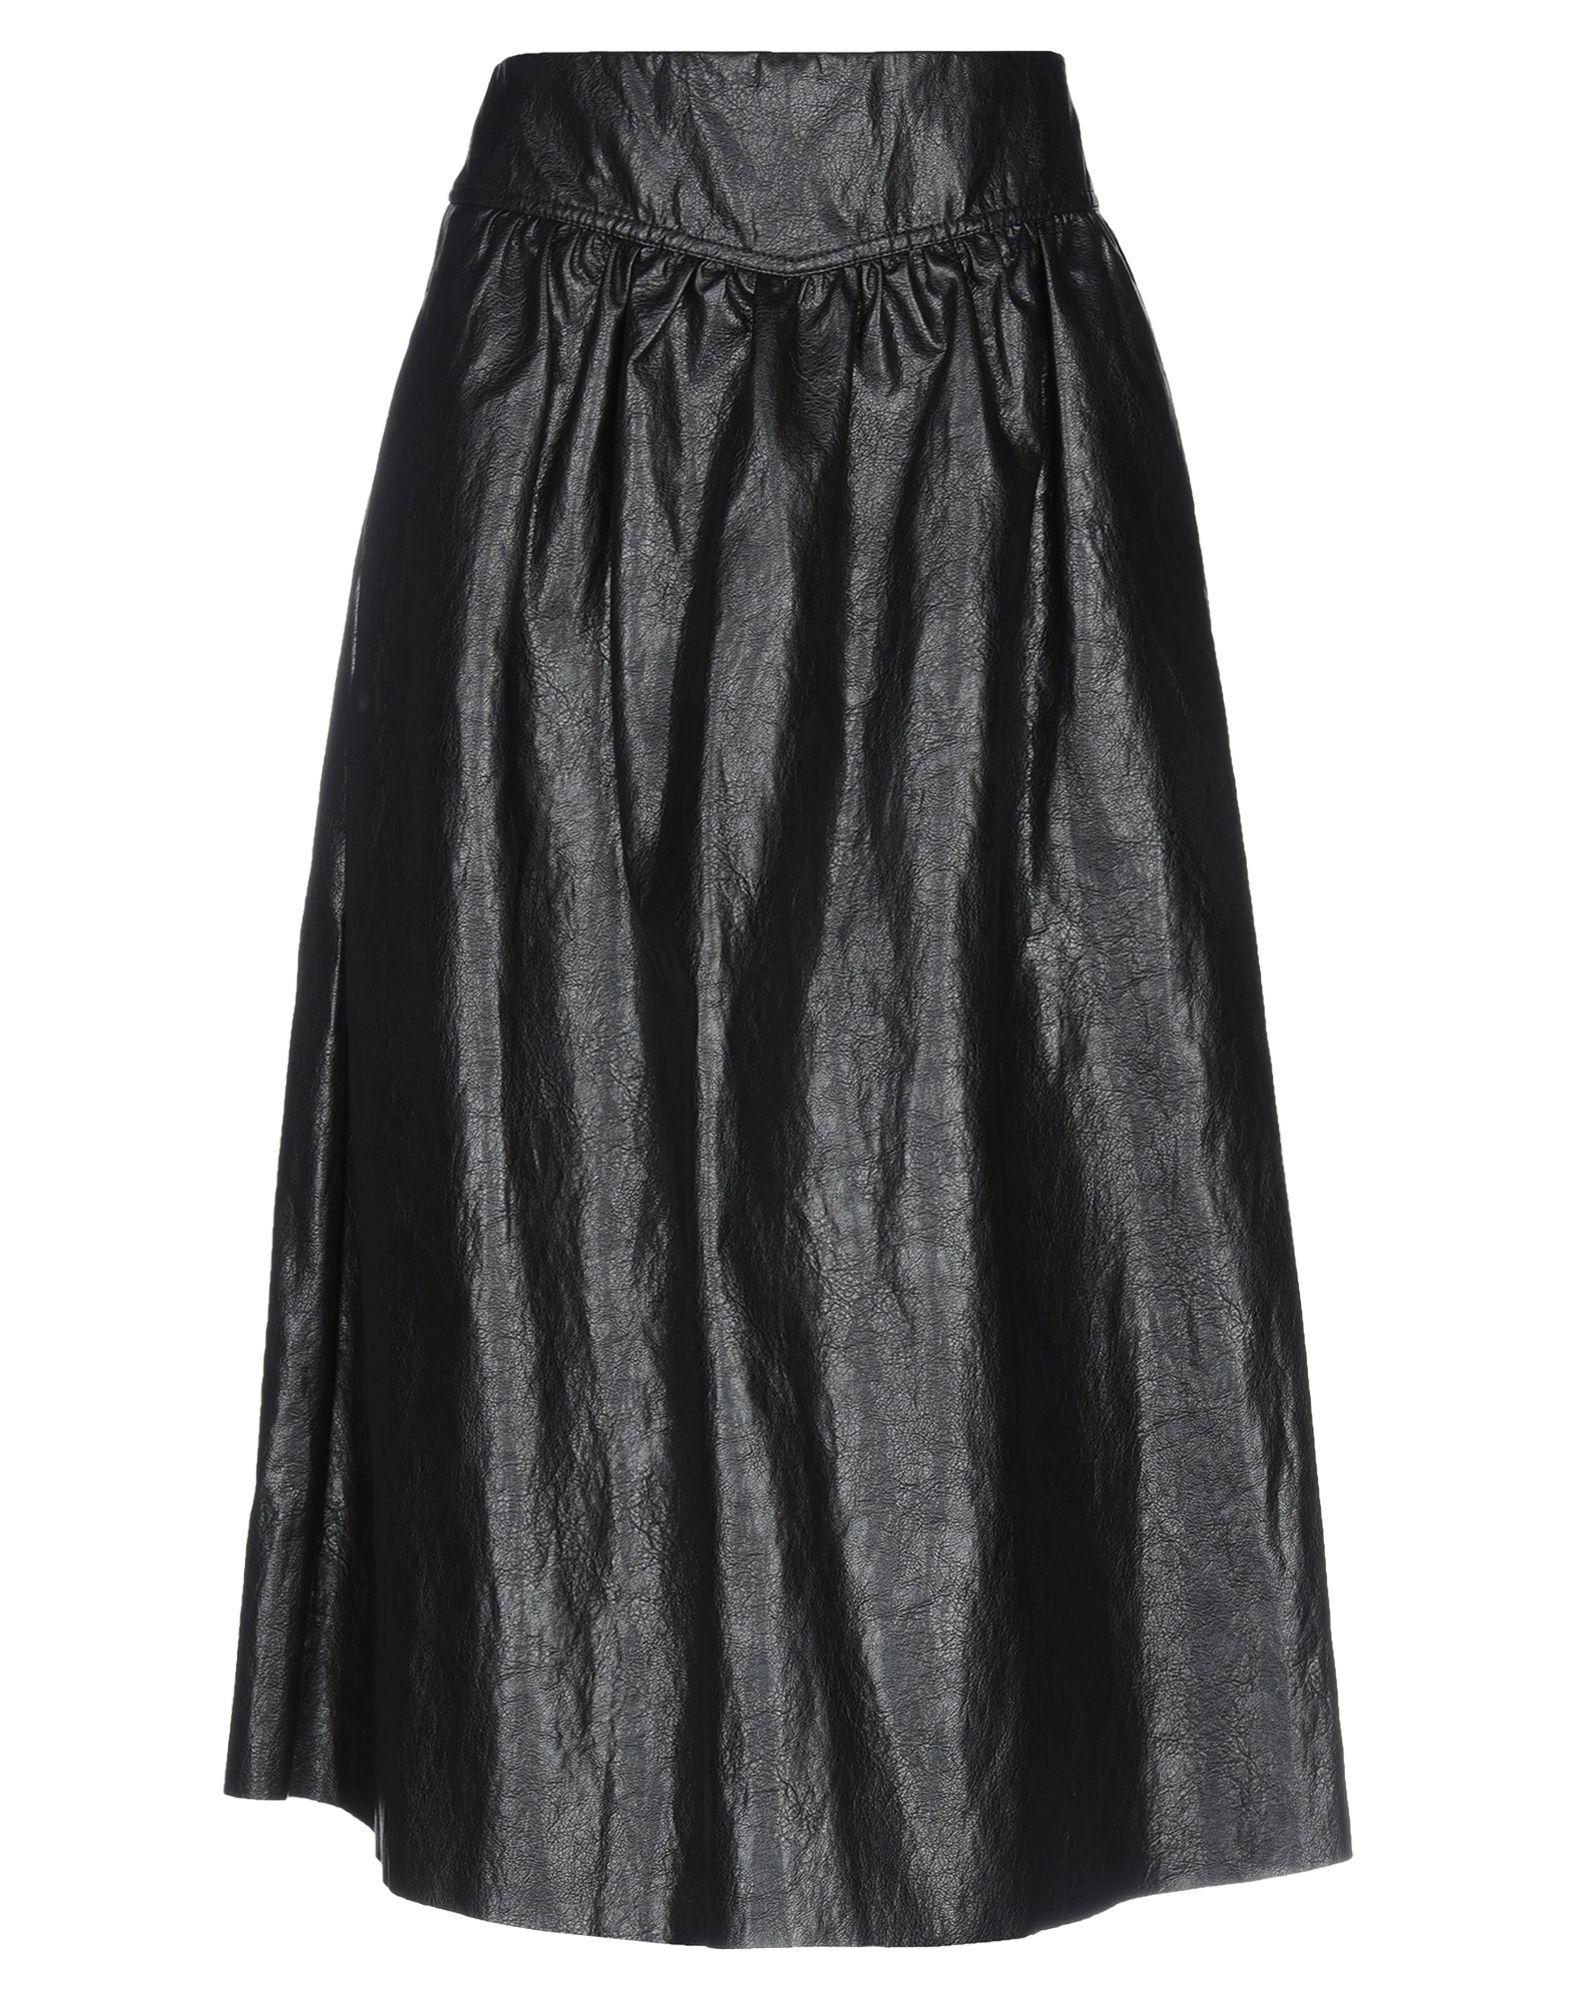 ATOS LOMBARDINI Юбка длиной 3/4 violet atos lombardini юбка длиной 3 4